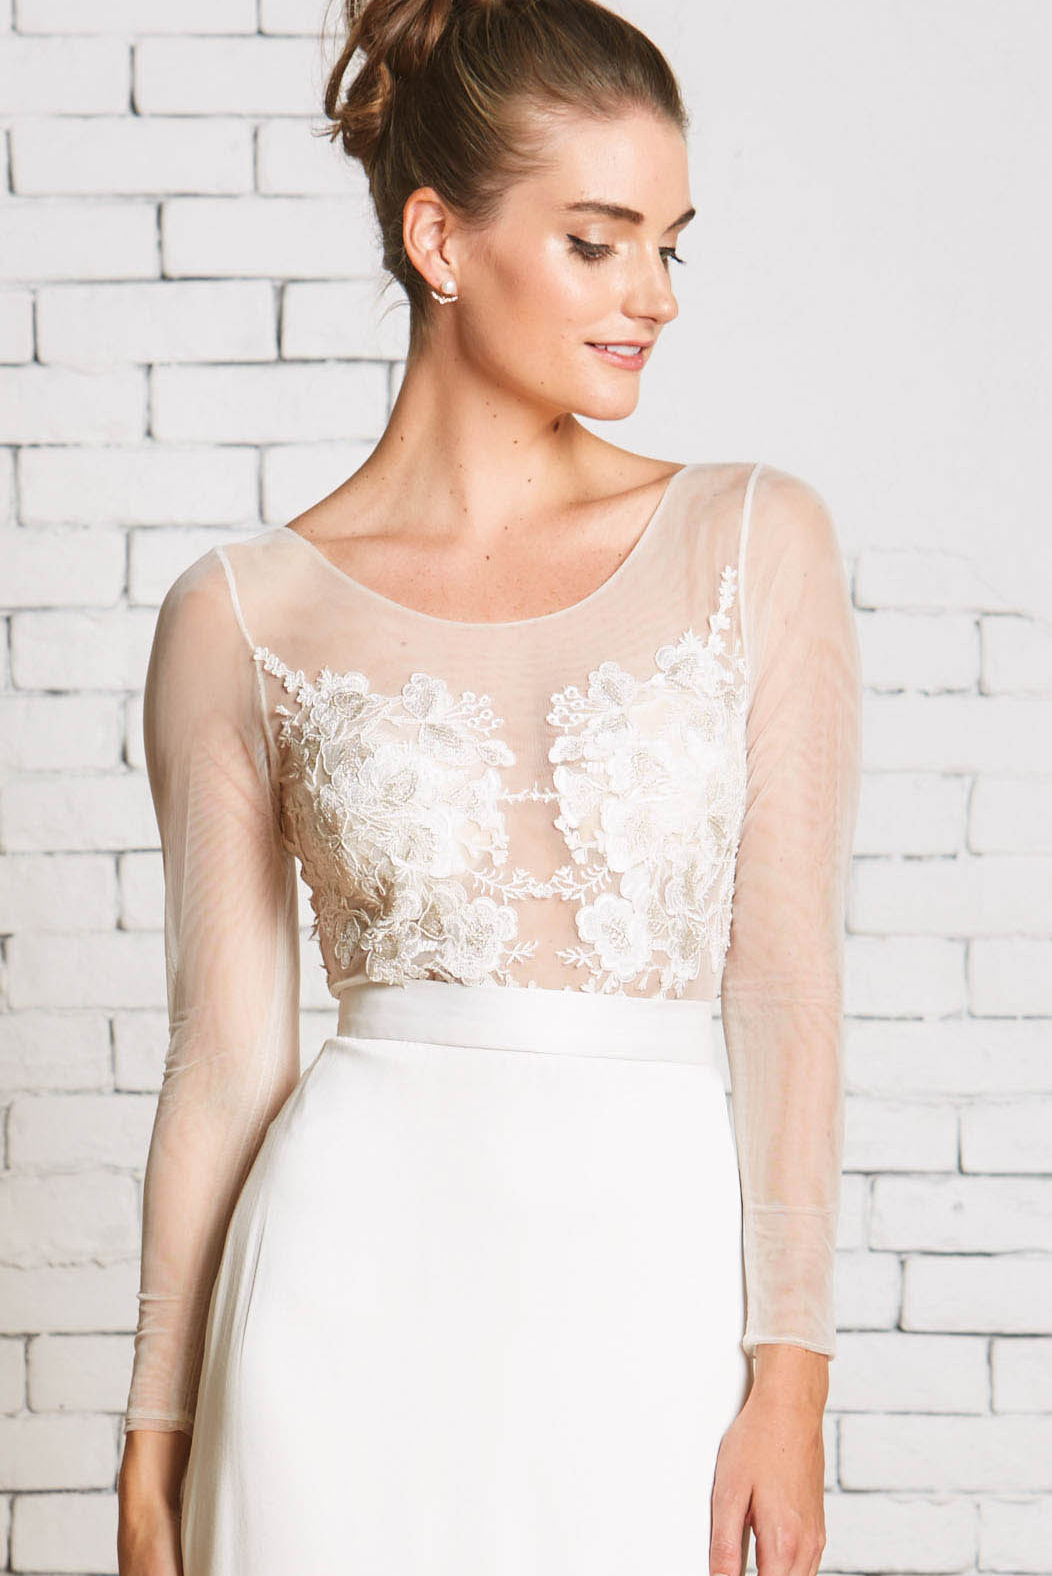 Rebecca_Schoneveld_Capri_Top_Frong_Bridal_Seperates_Long_Sleeve_wedding_Dress.jpg